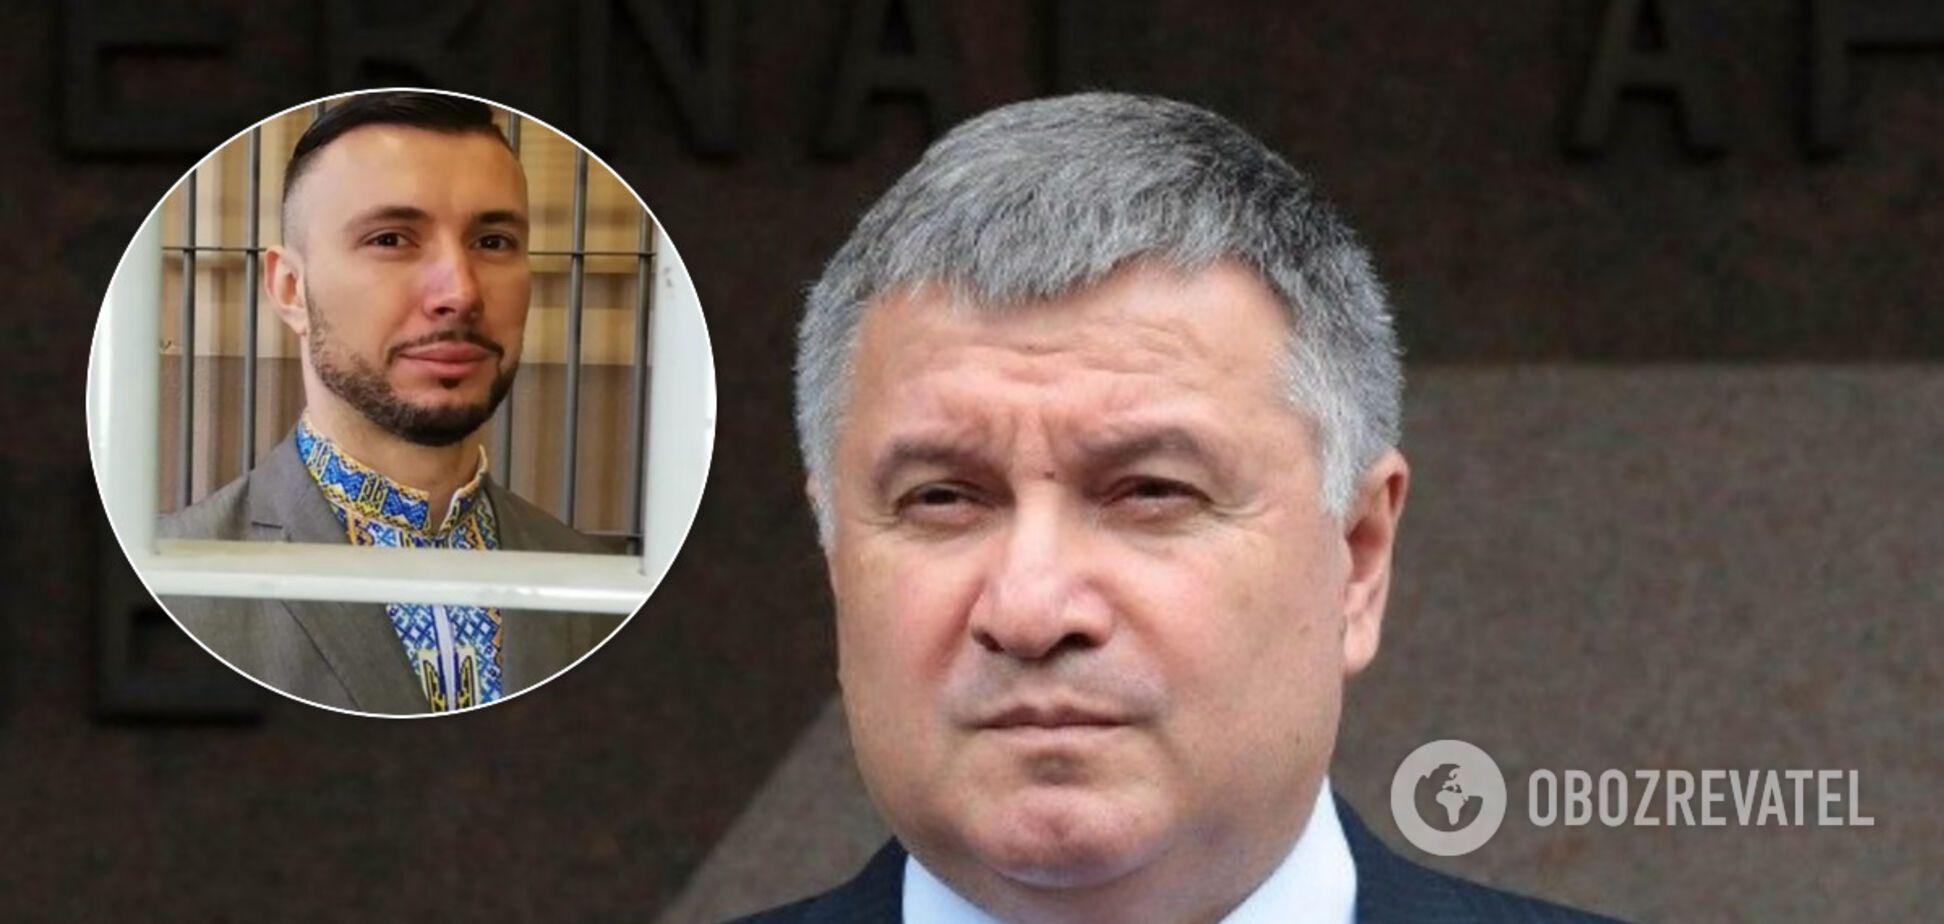 Аваков пообещал довести до конца освобождение Маркива